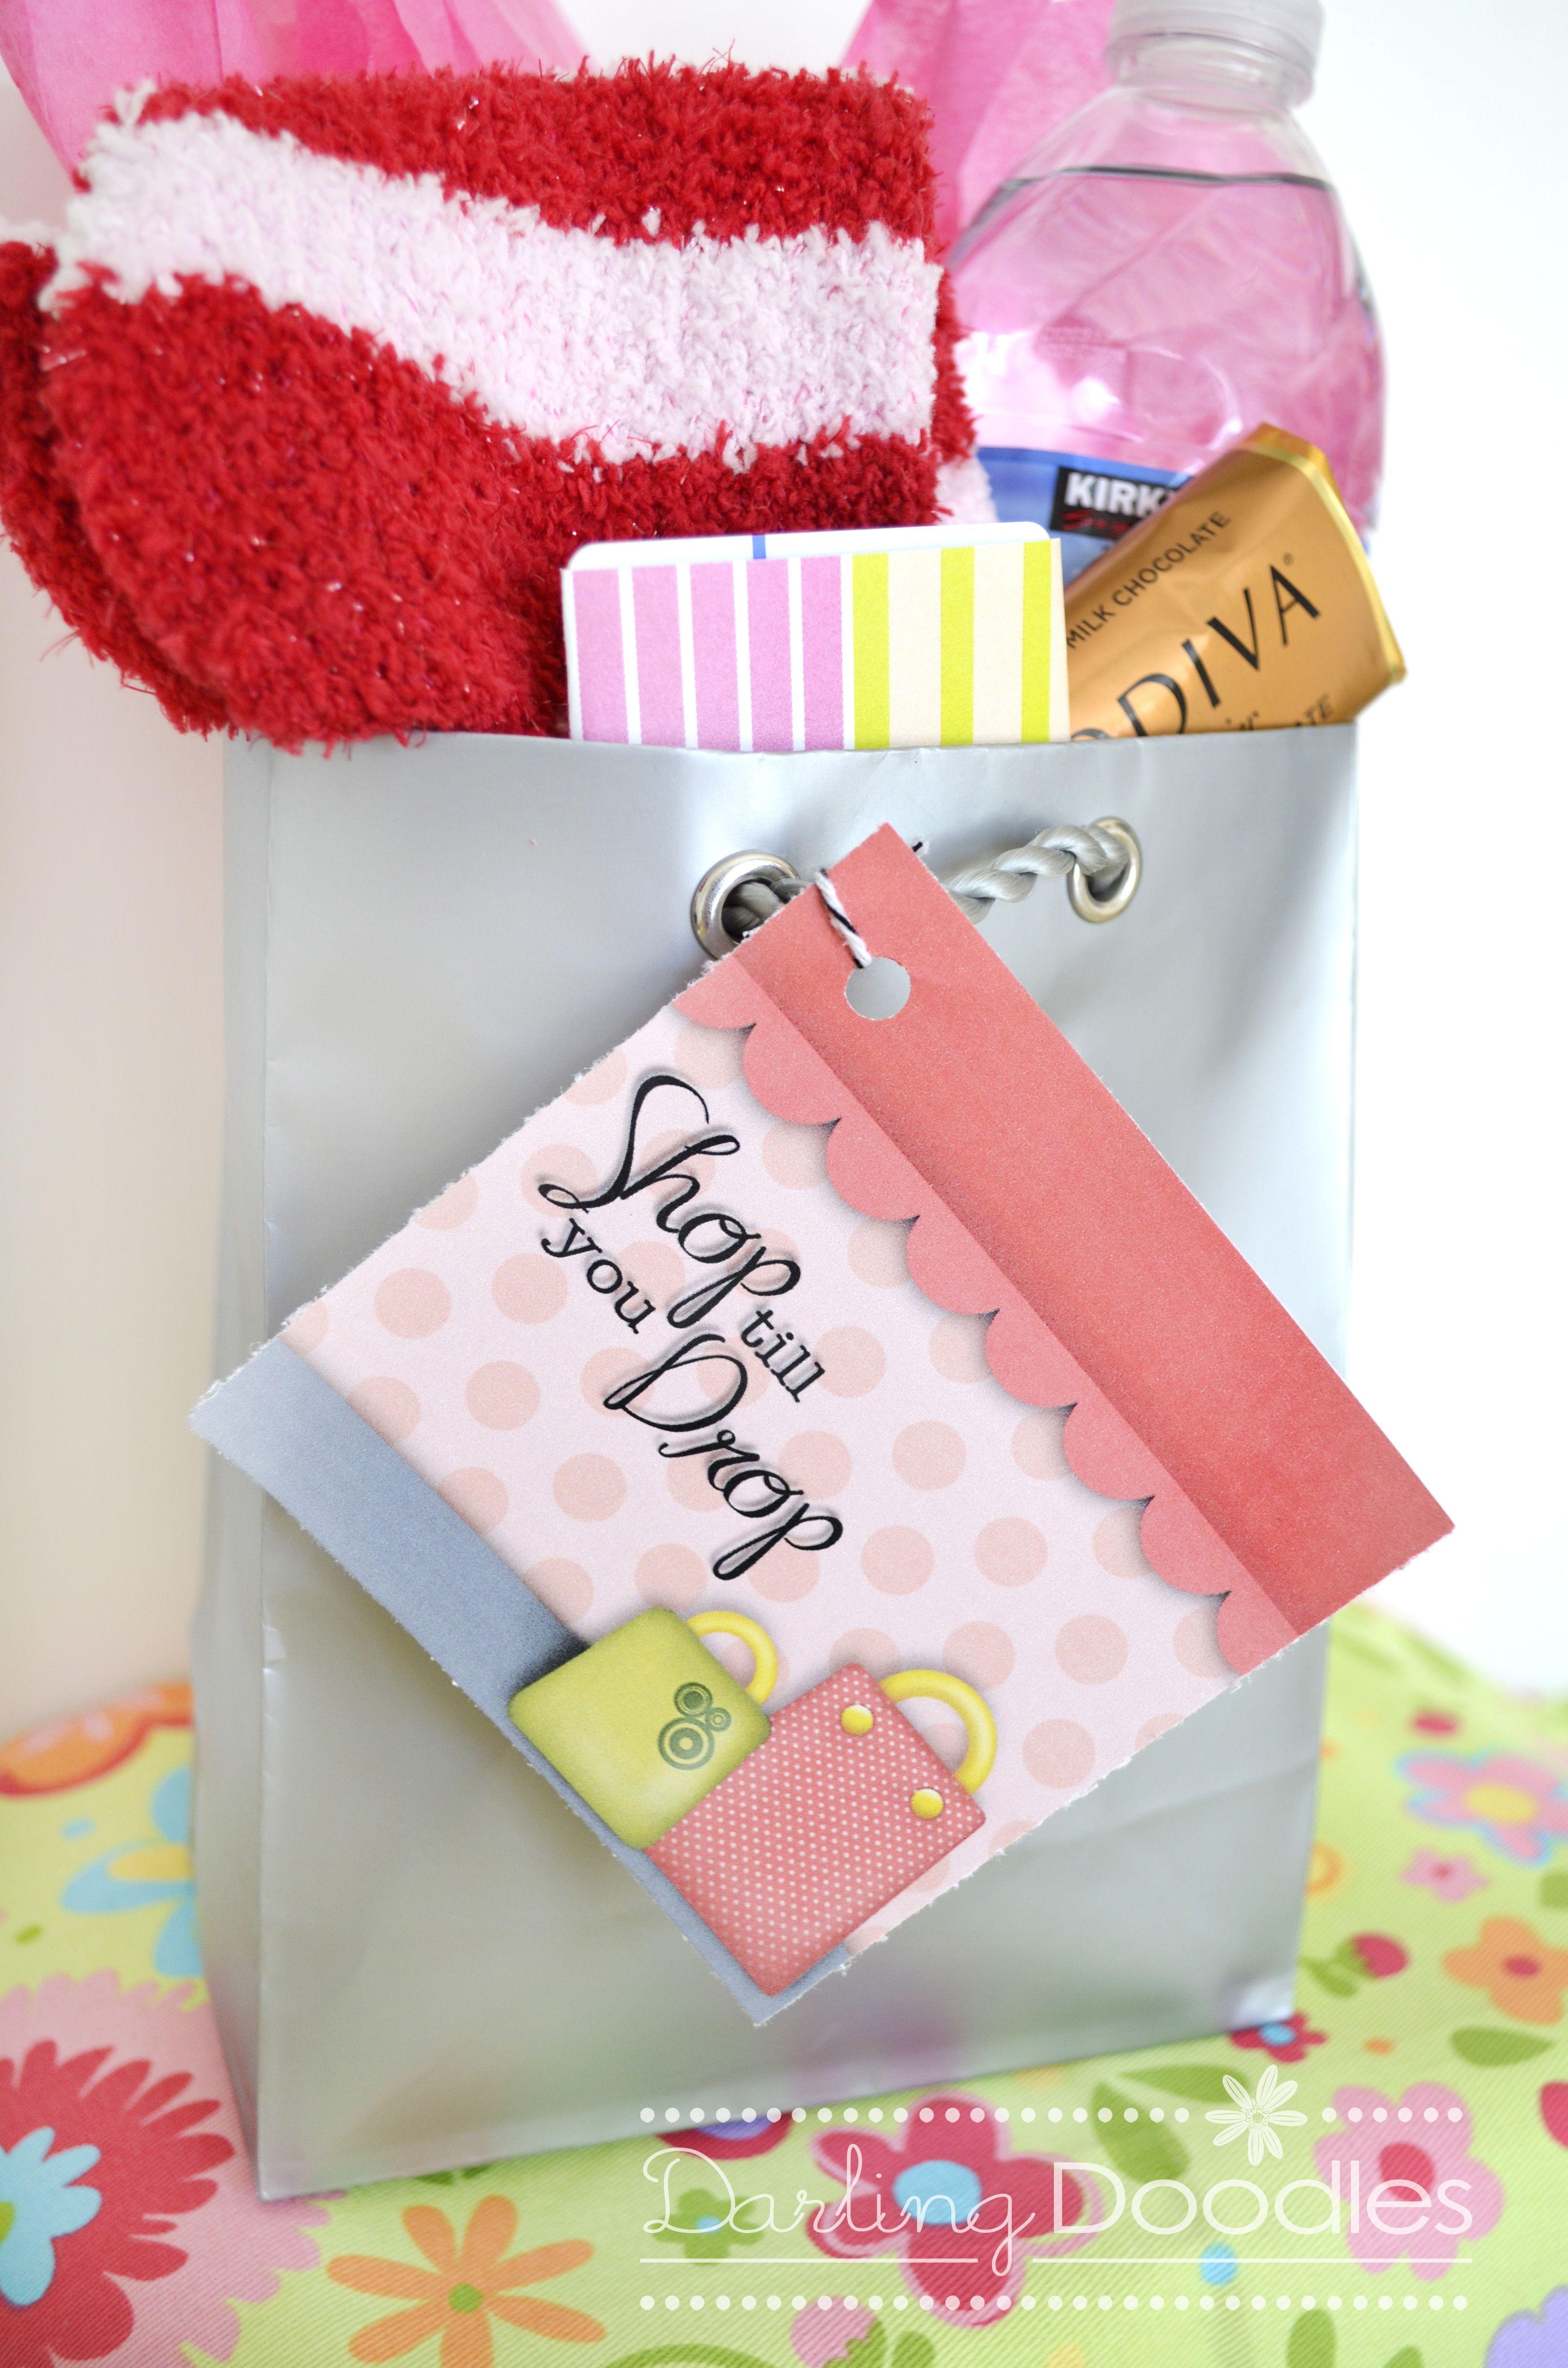 Shop Til You Drop Gift Idea | Gift Ideas | Pinterest | Drop, Gift ...